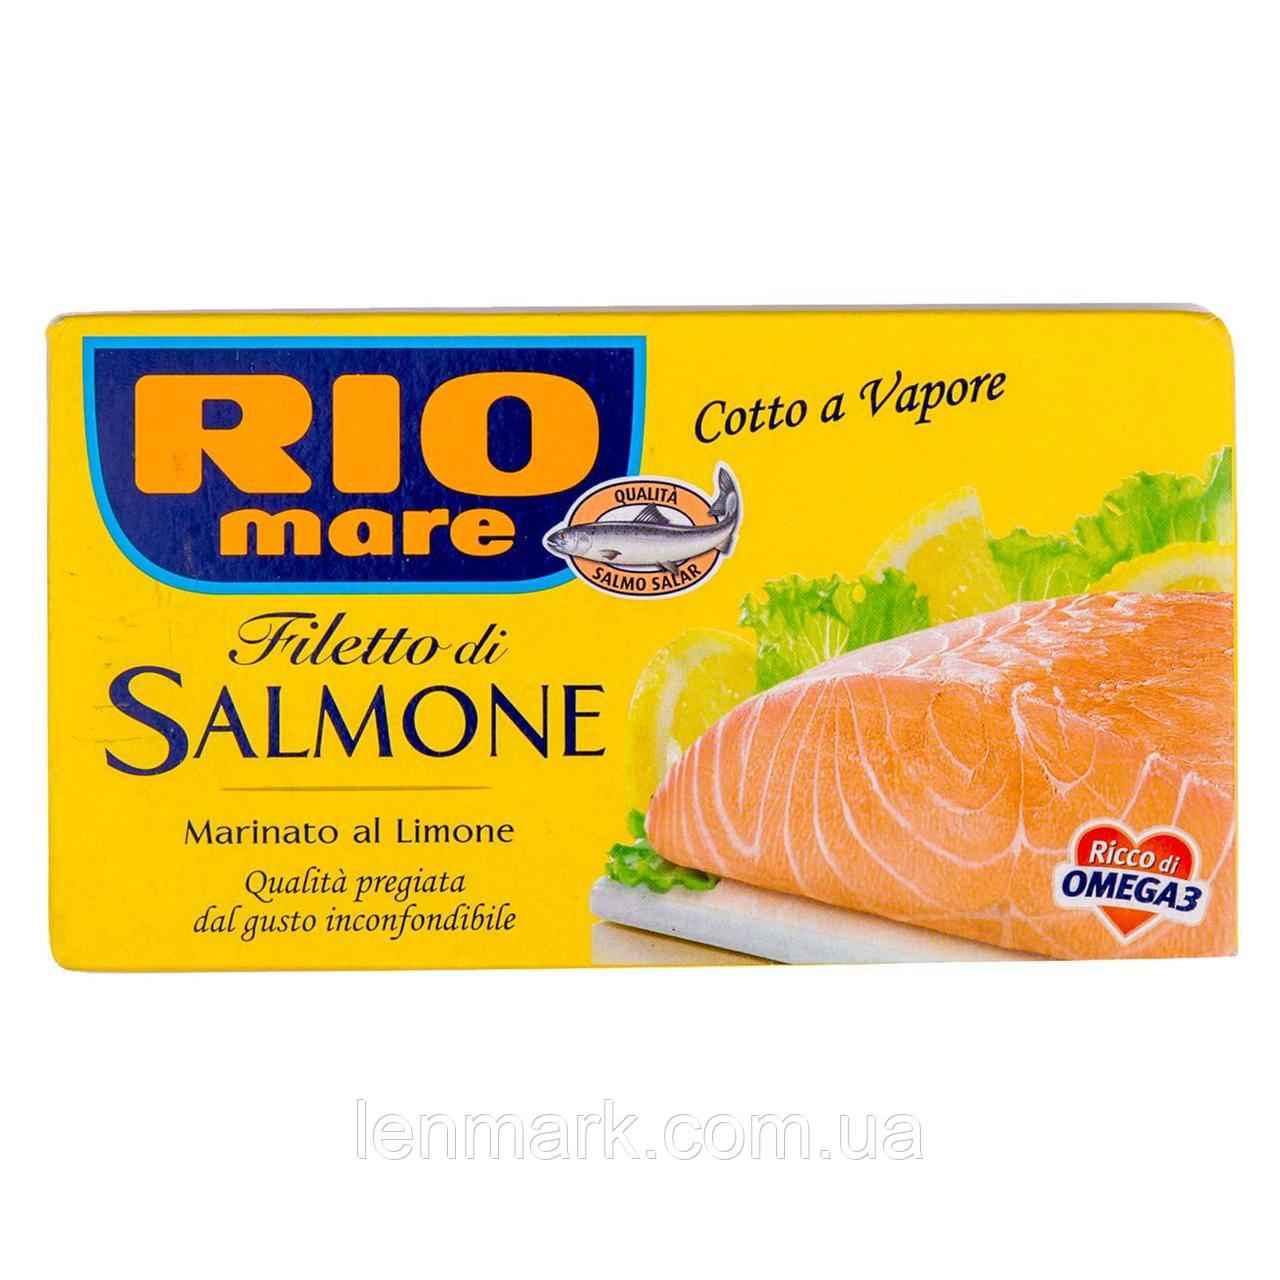 Филе лосося маринованное  с лимоном Rio mare Filetto di salmone Marinato al Limone 150г